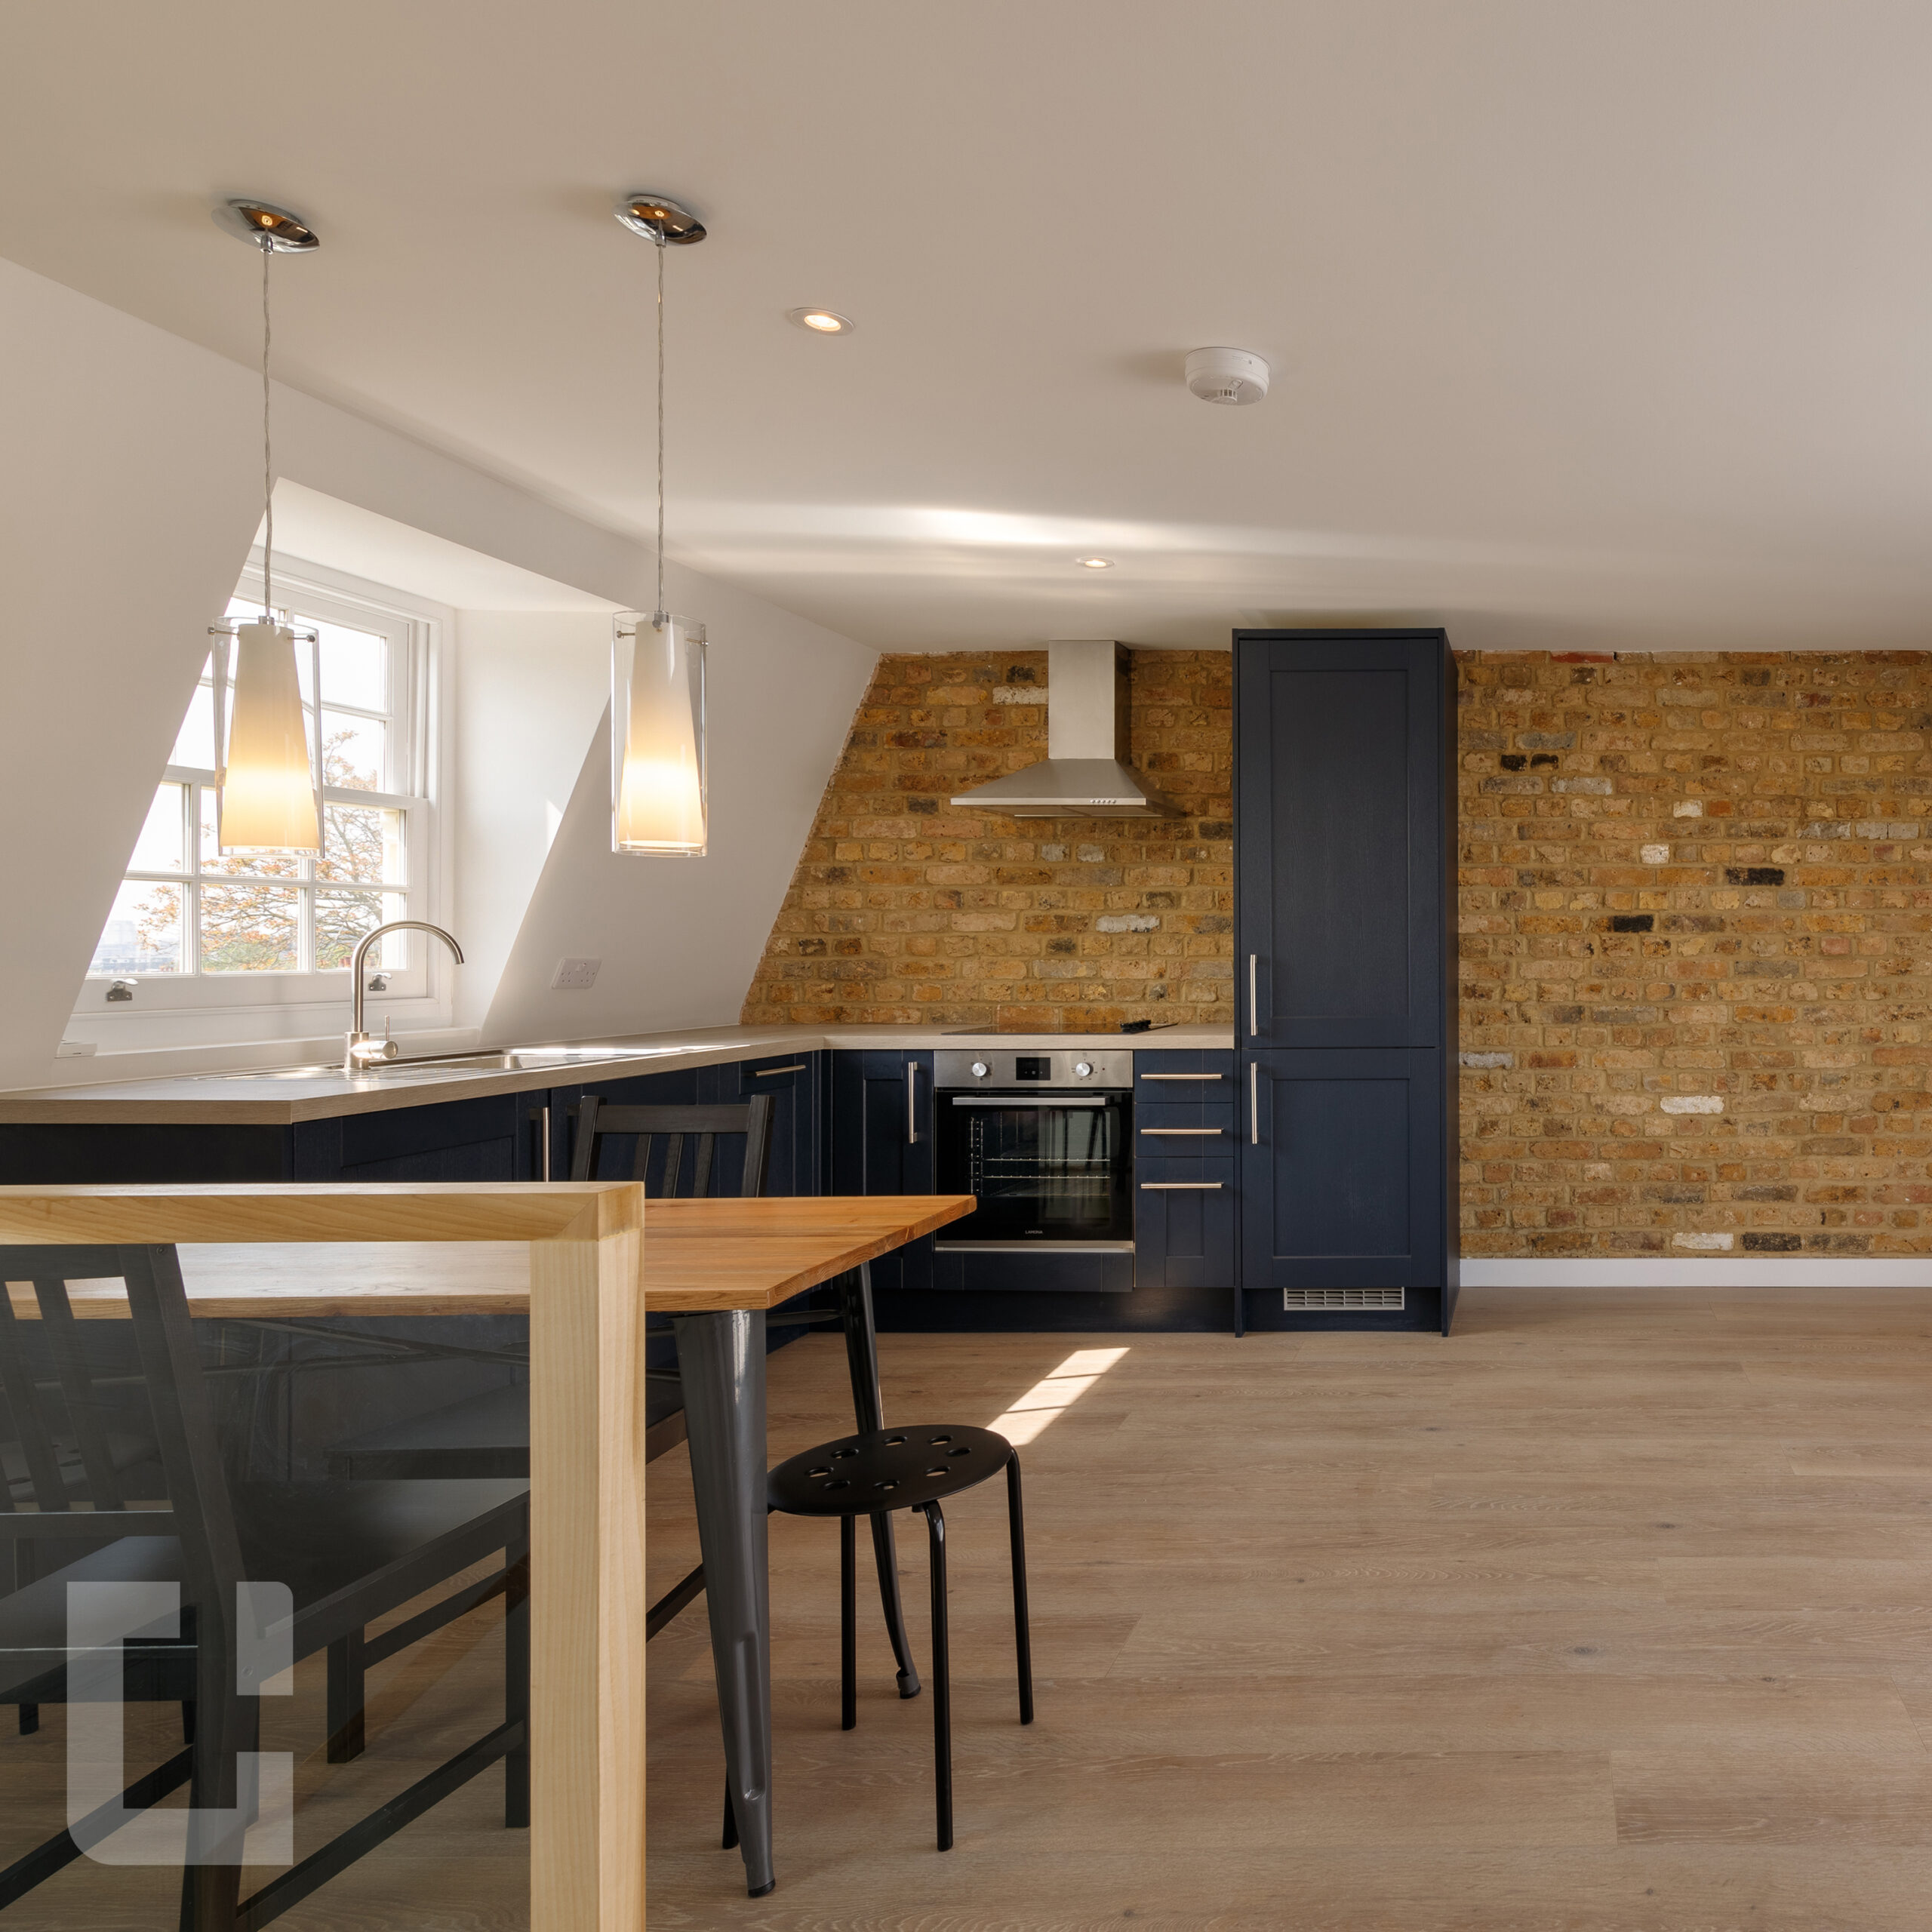 Loft Conversion Studio With Brick Wall